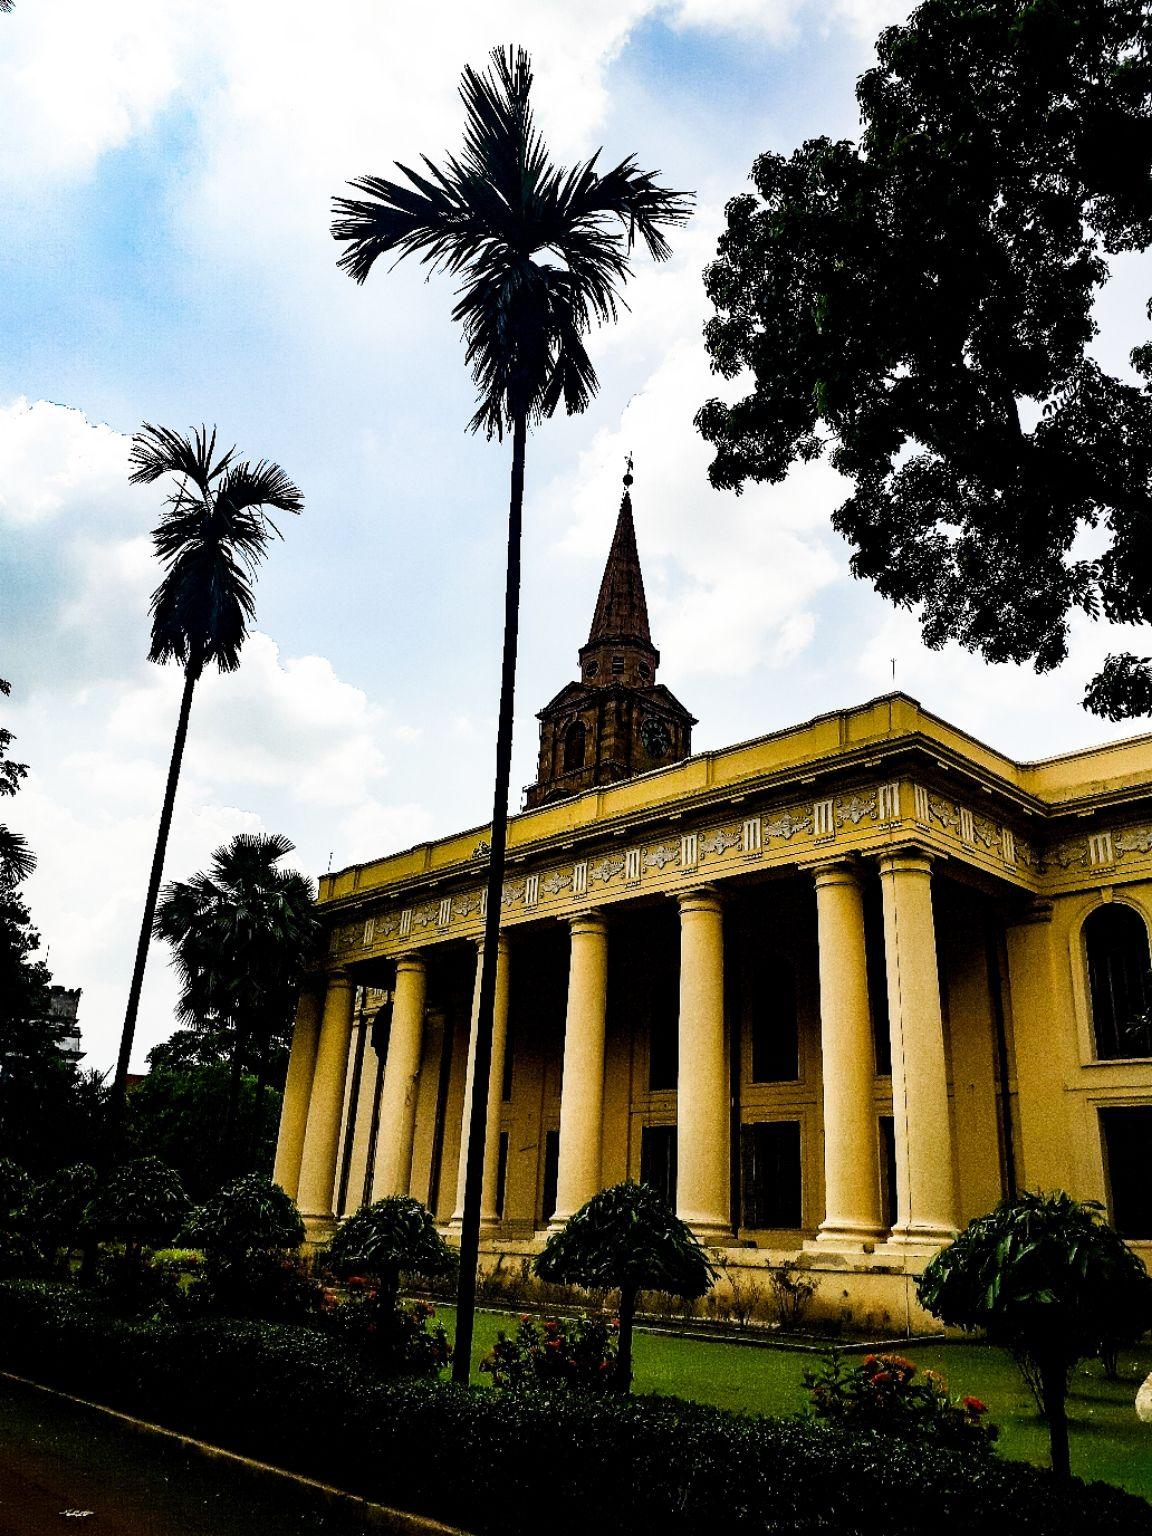 Photo of St. John's Church By Payel Banerjee